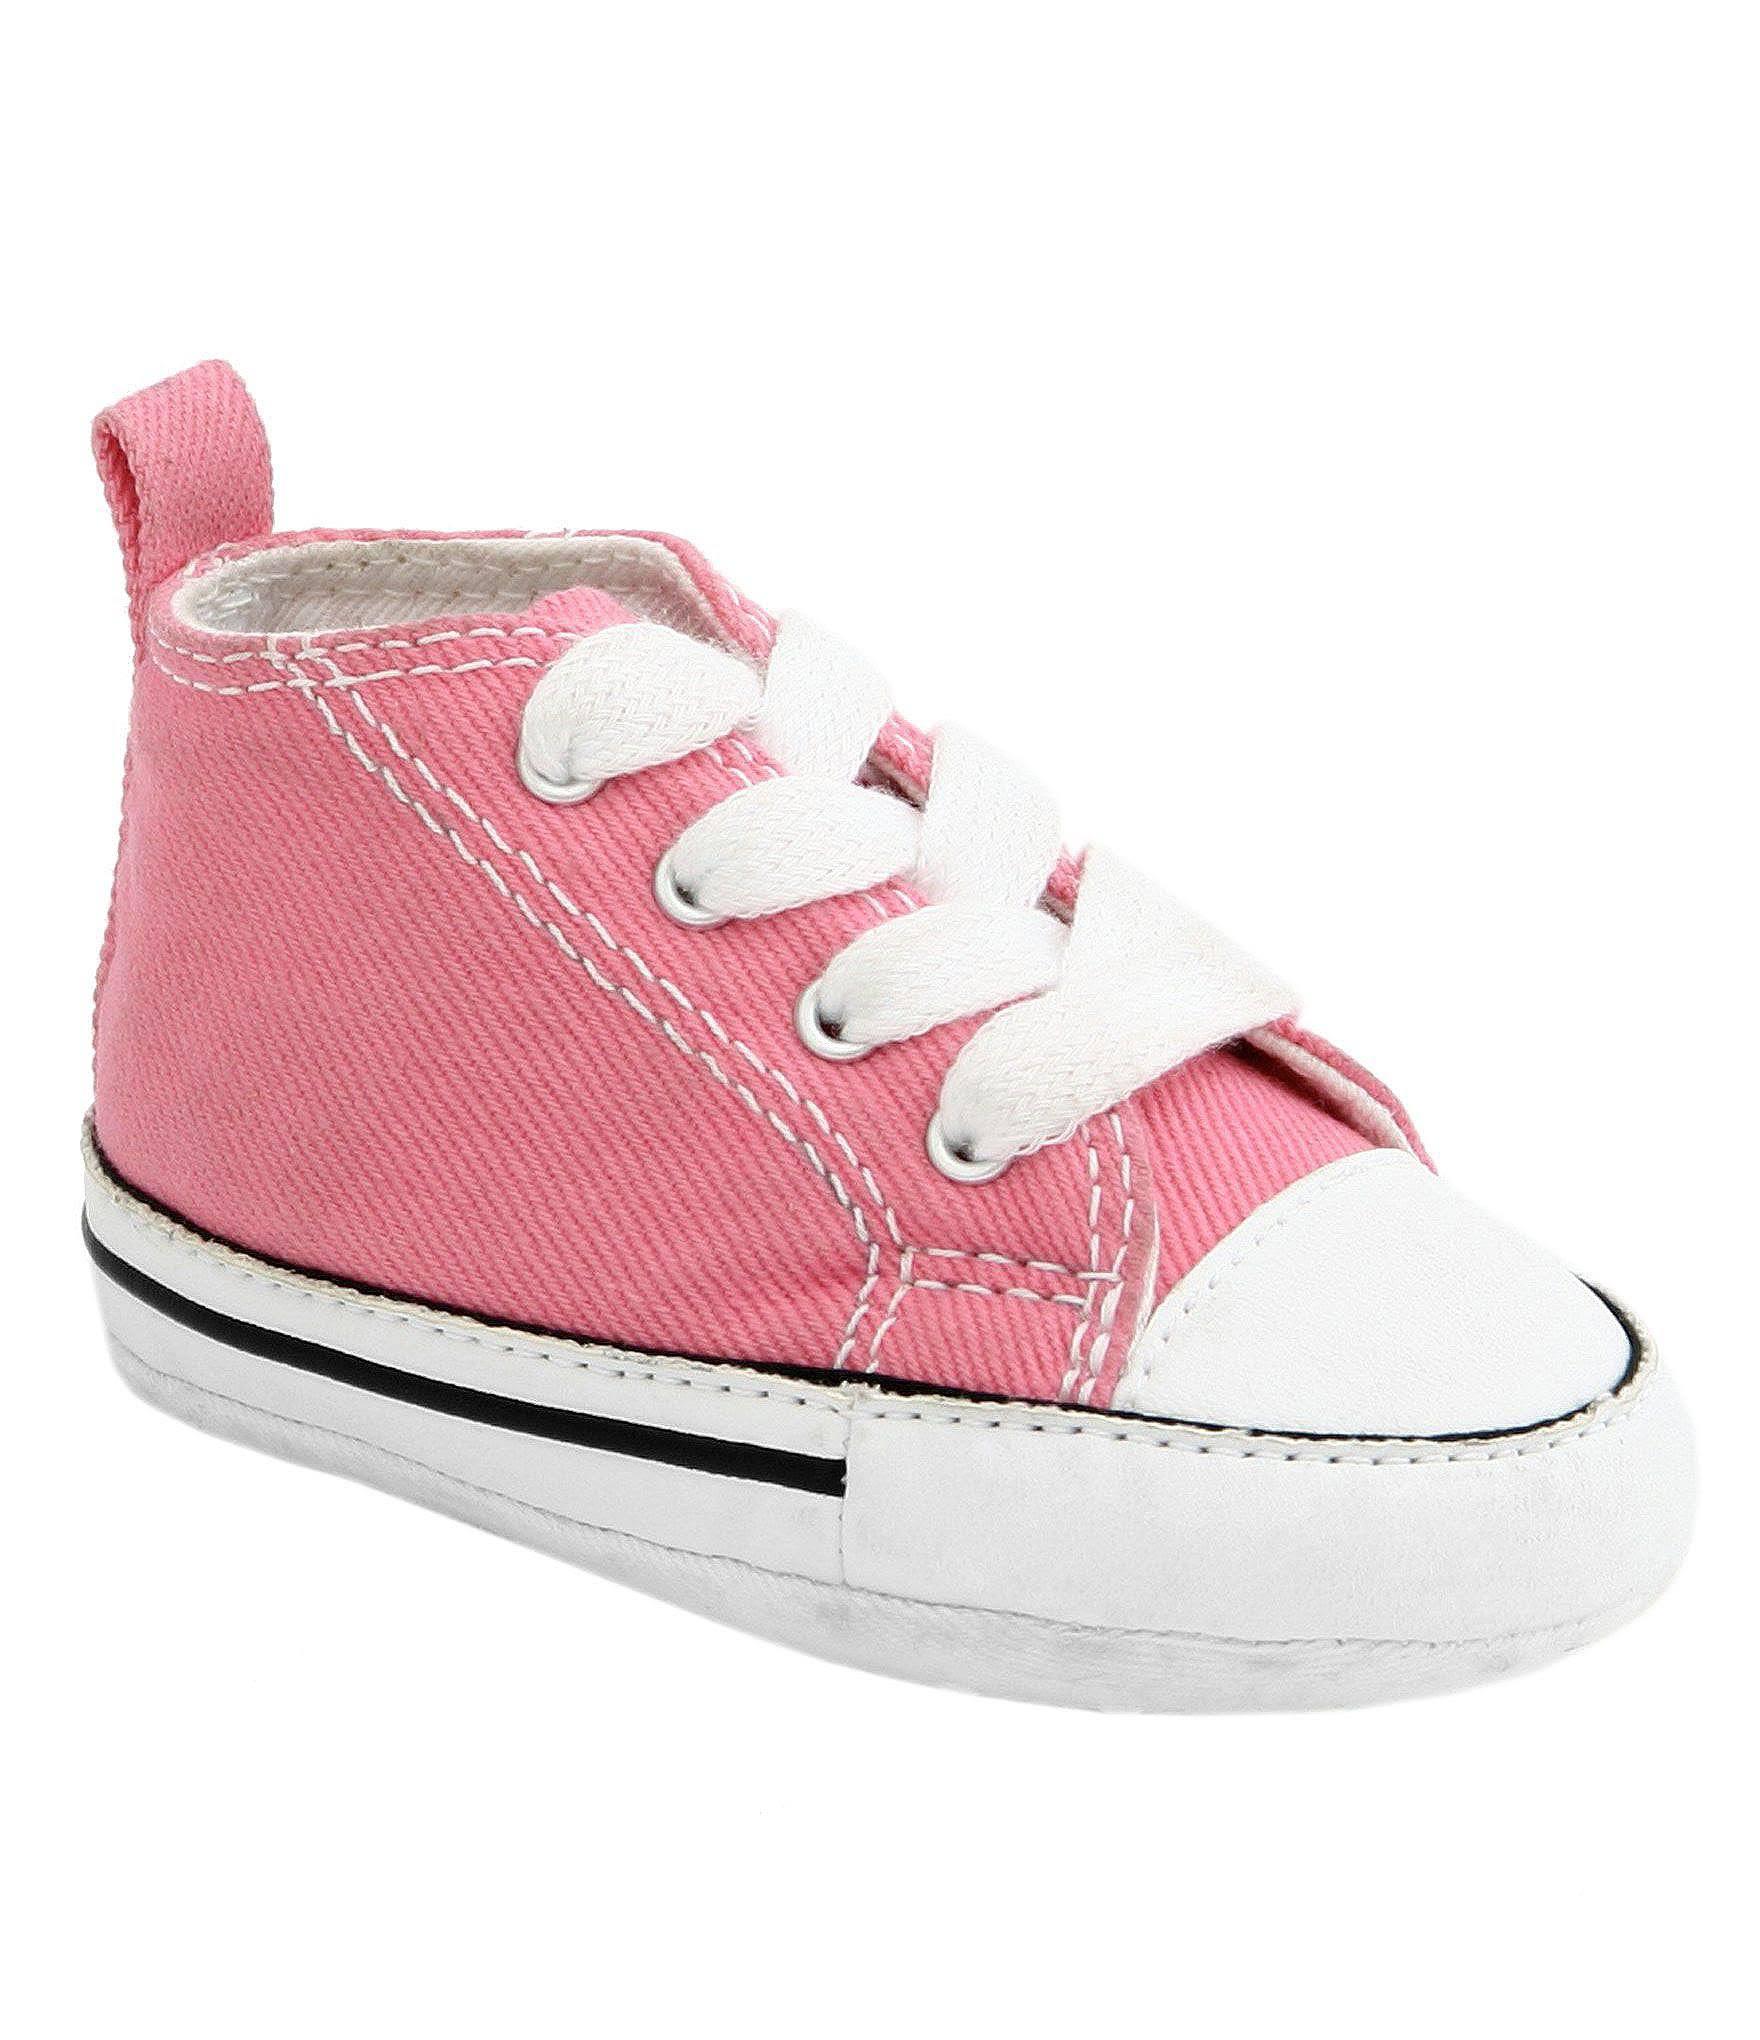 Converse Infantil 88871 Niñas First Star Tamaño 4 Para 0 Cuna Calzado Iq0IrwPf